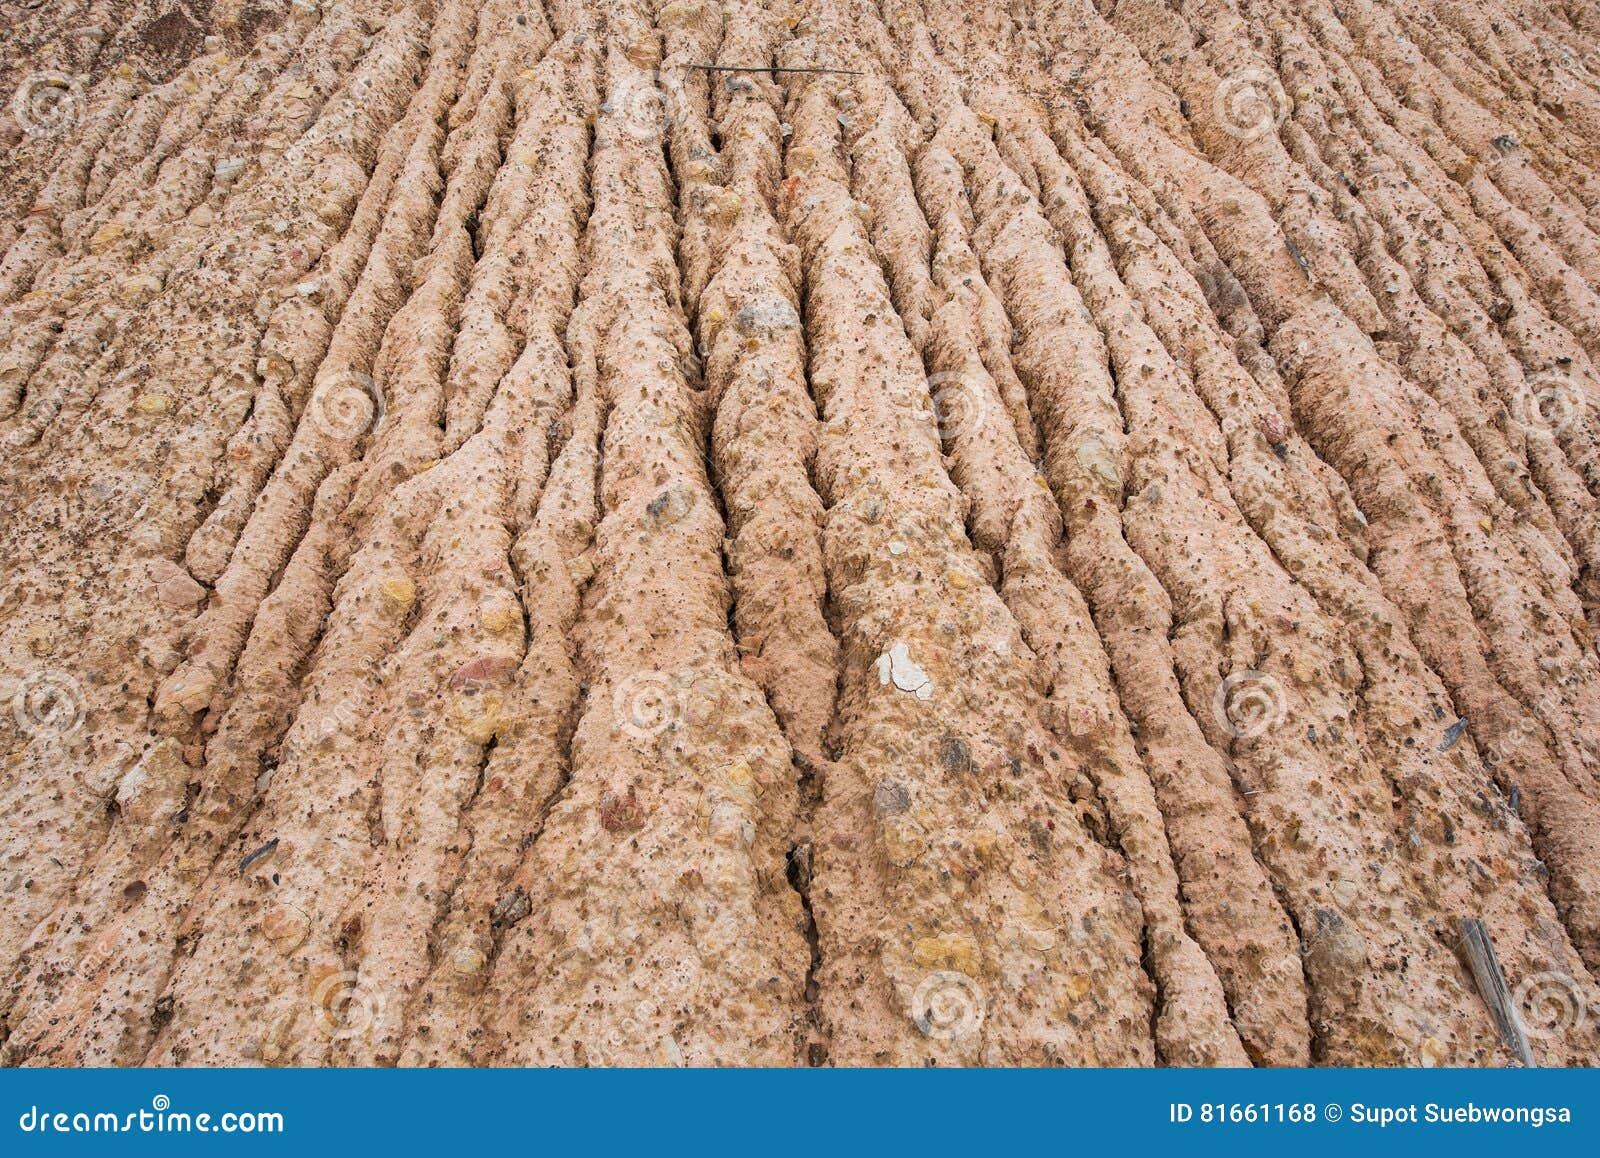 soil erosion by water pdf